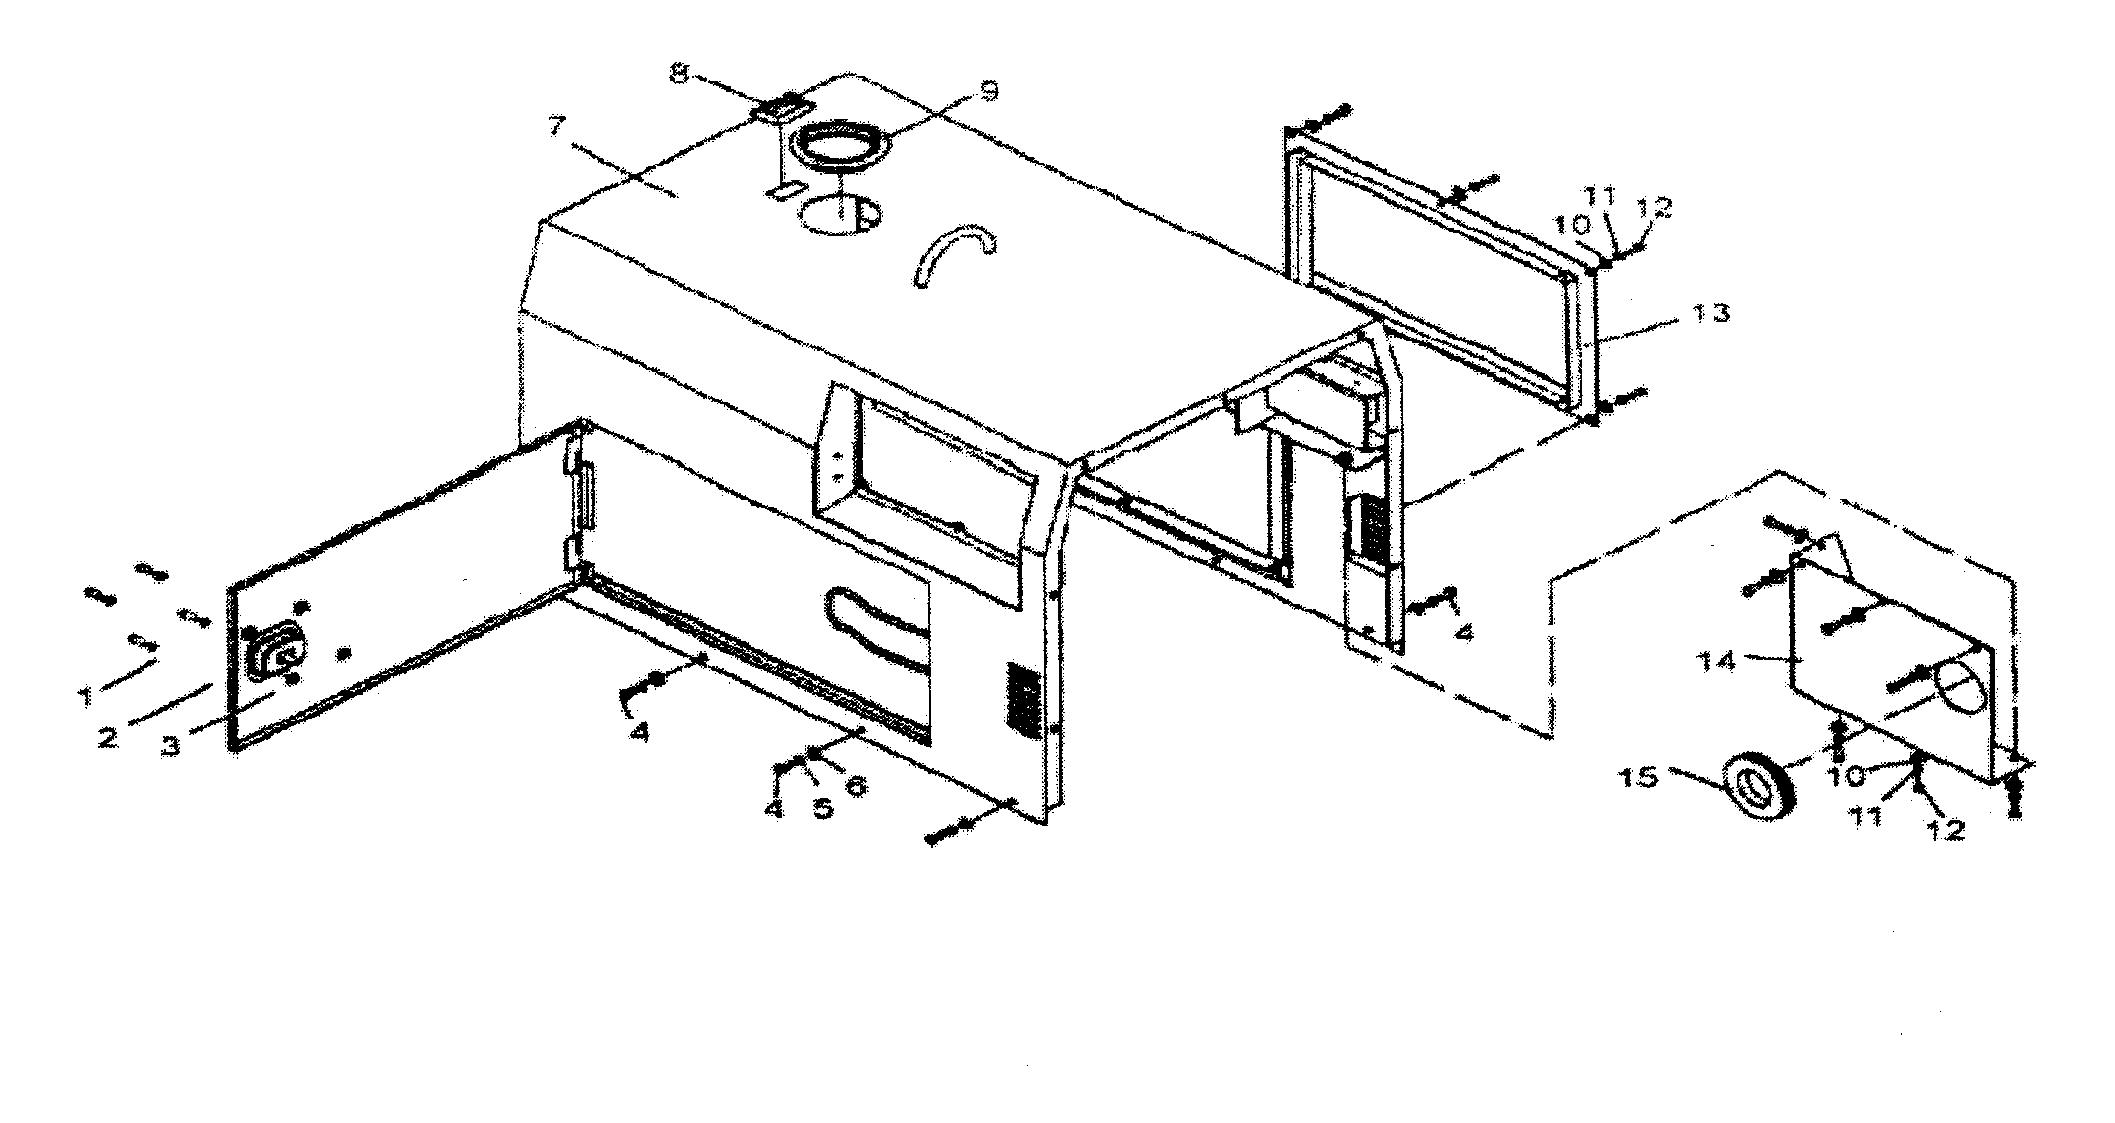 All-Power model APG3202D generator genuine parts